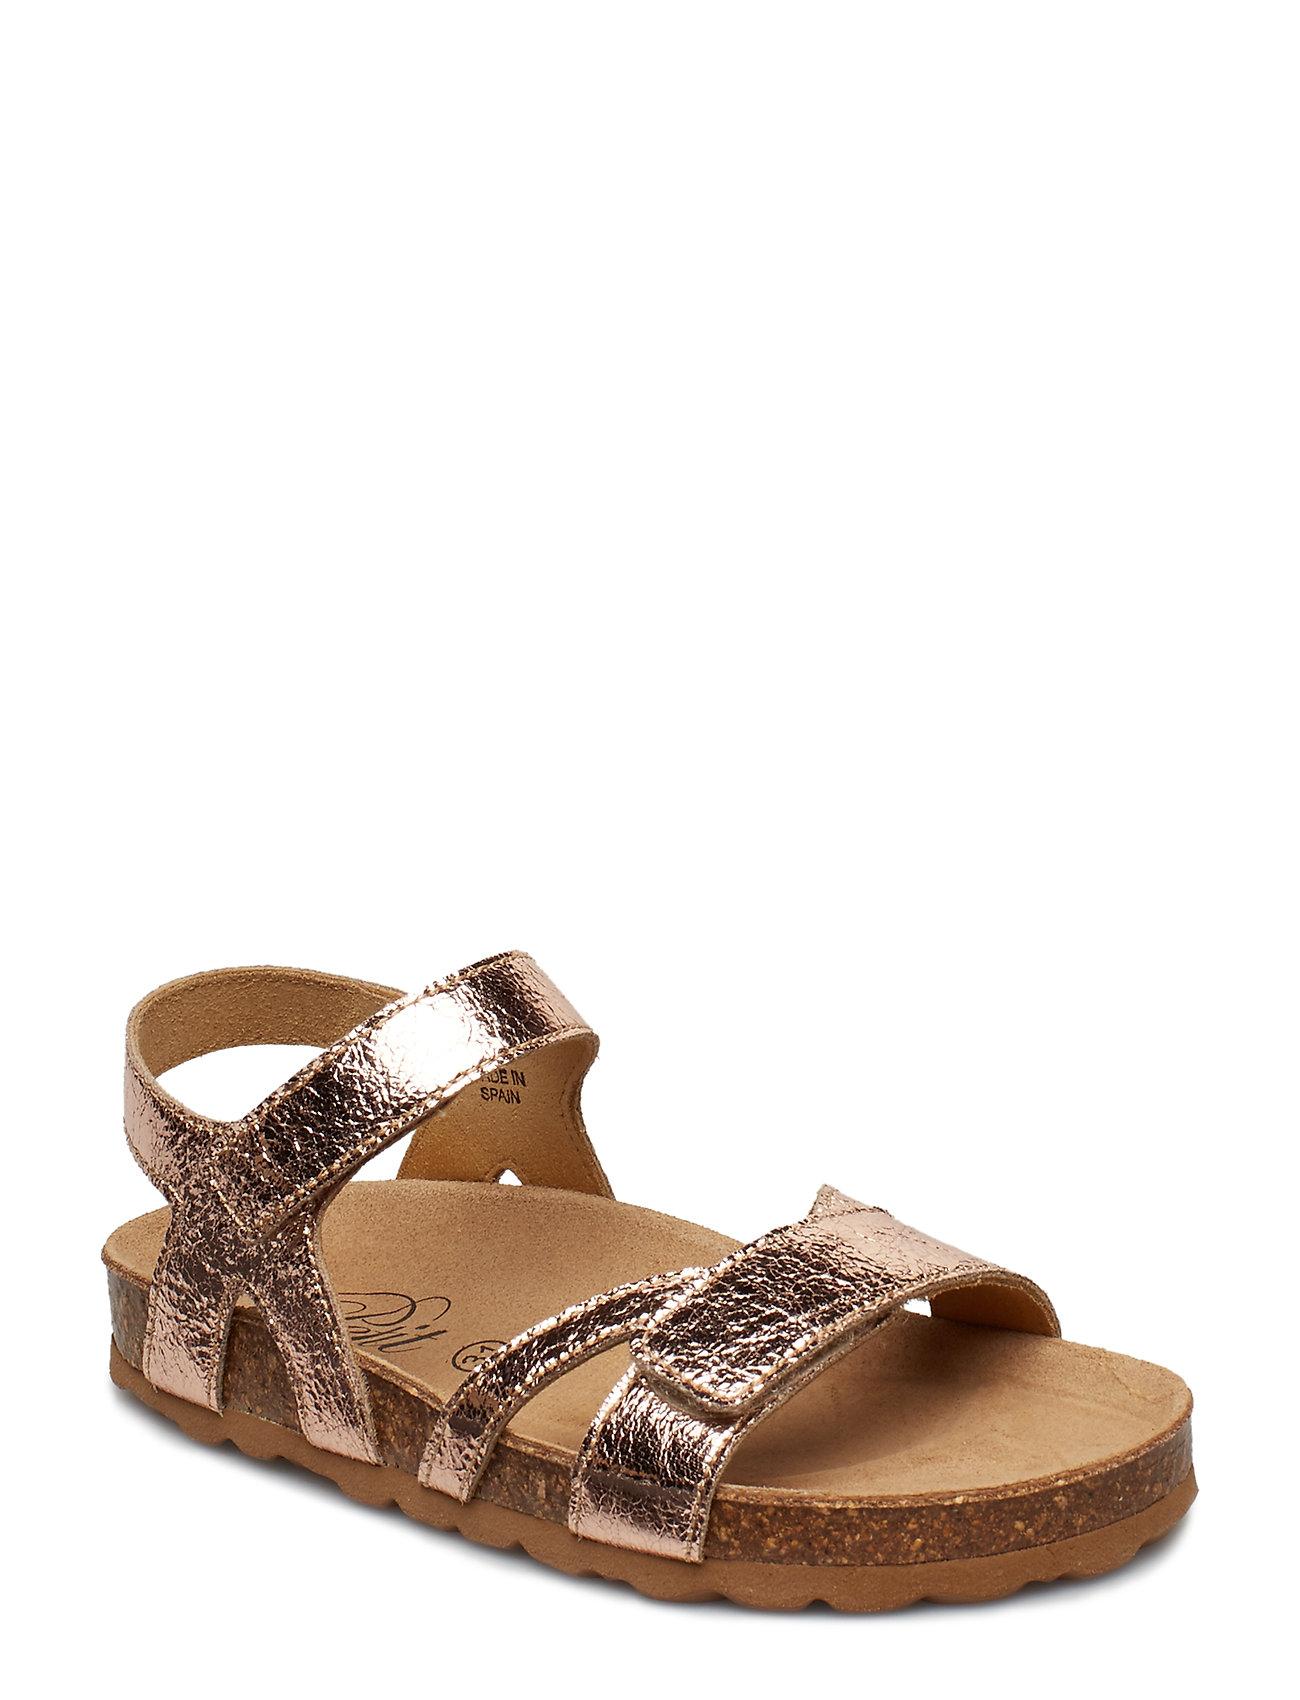 9a6805c215b Rød Petit by Sofie Schnoor Sandal sandaler for børn - Pashion.dk